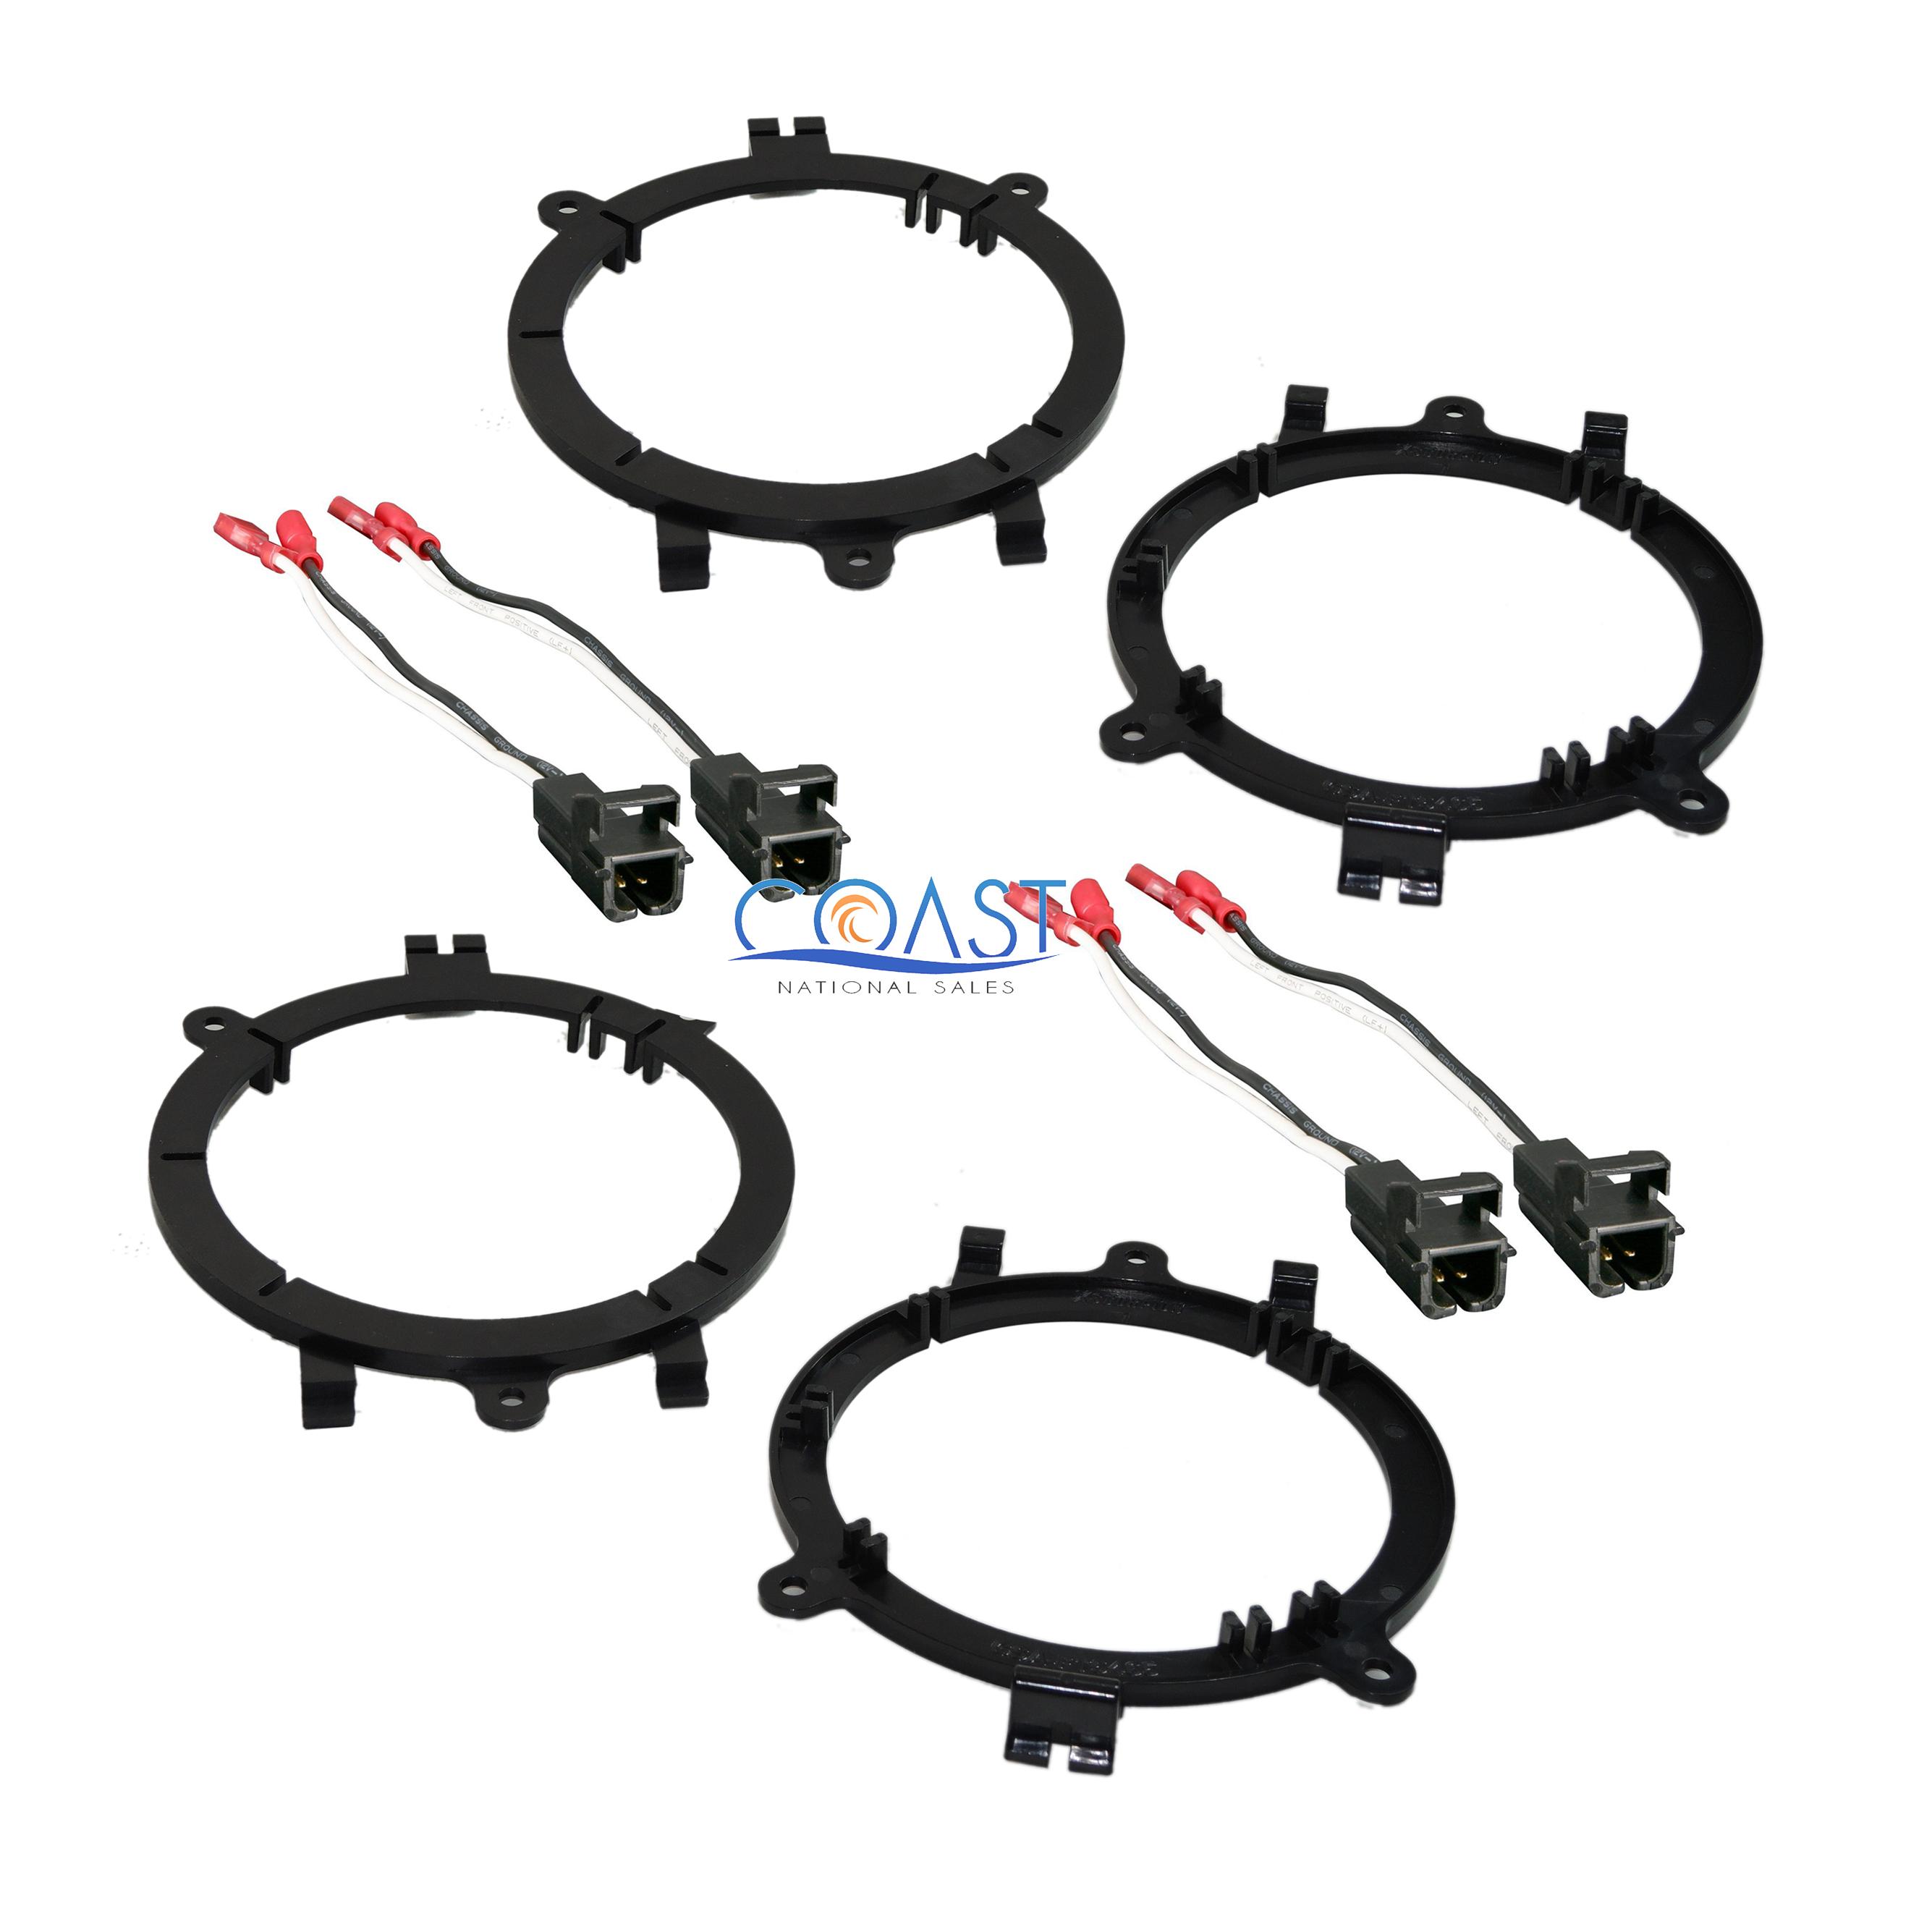 metra speaker wire harness adapters